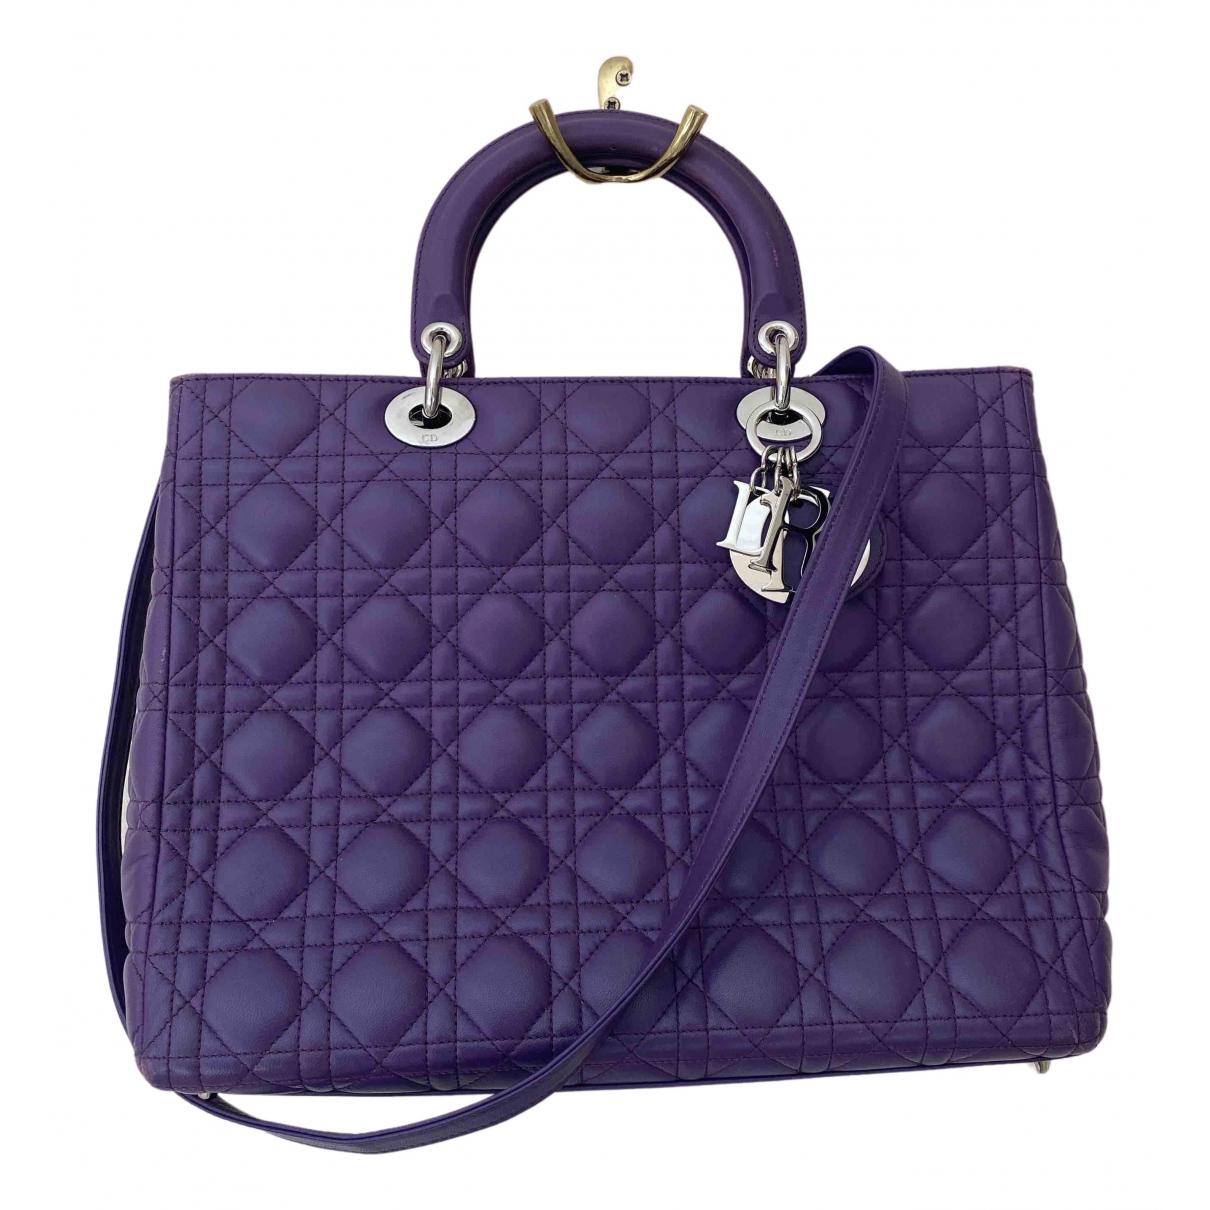 Dior - Sac a main Lady Dior pour femme en cuir - violet